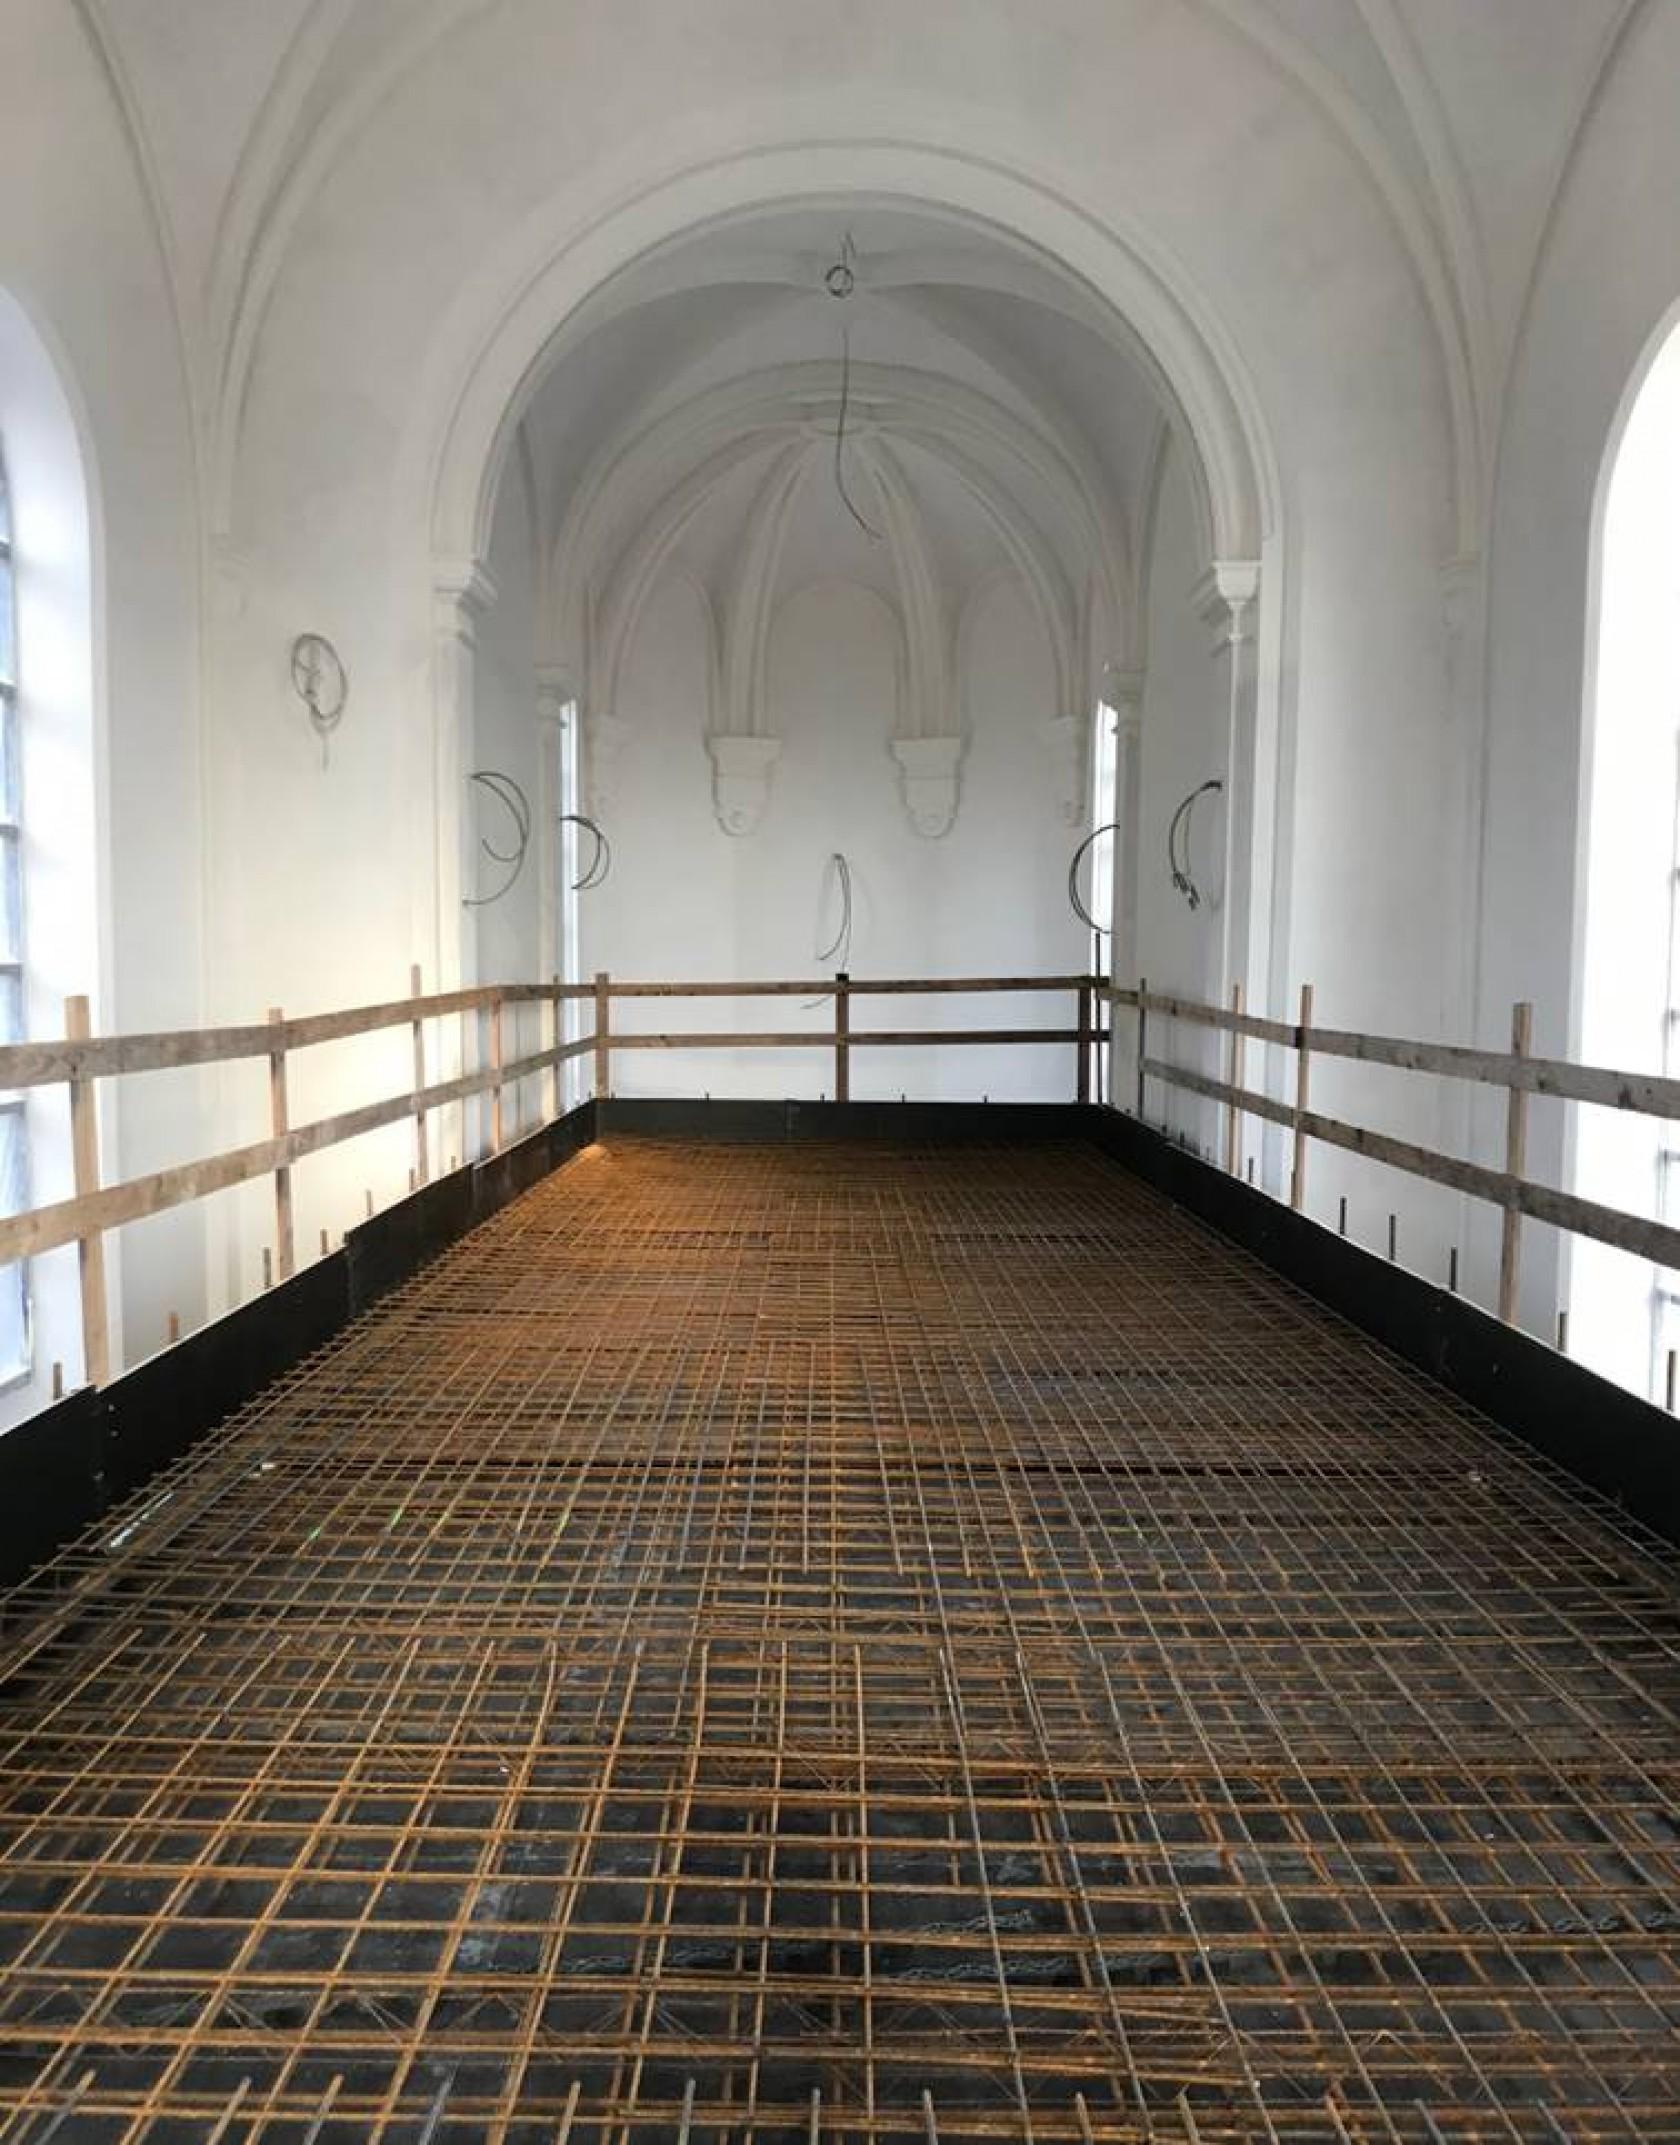 Abscis Architecten - vloer mezzanine bibliotheek in voormalige kapel